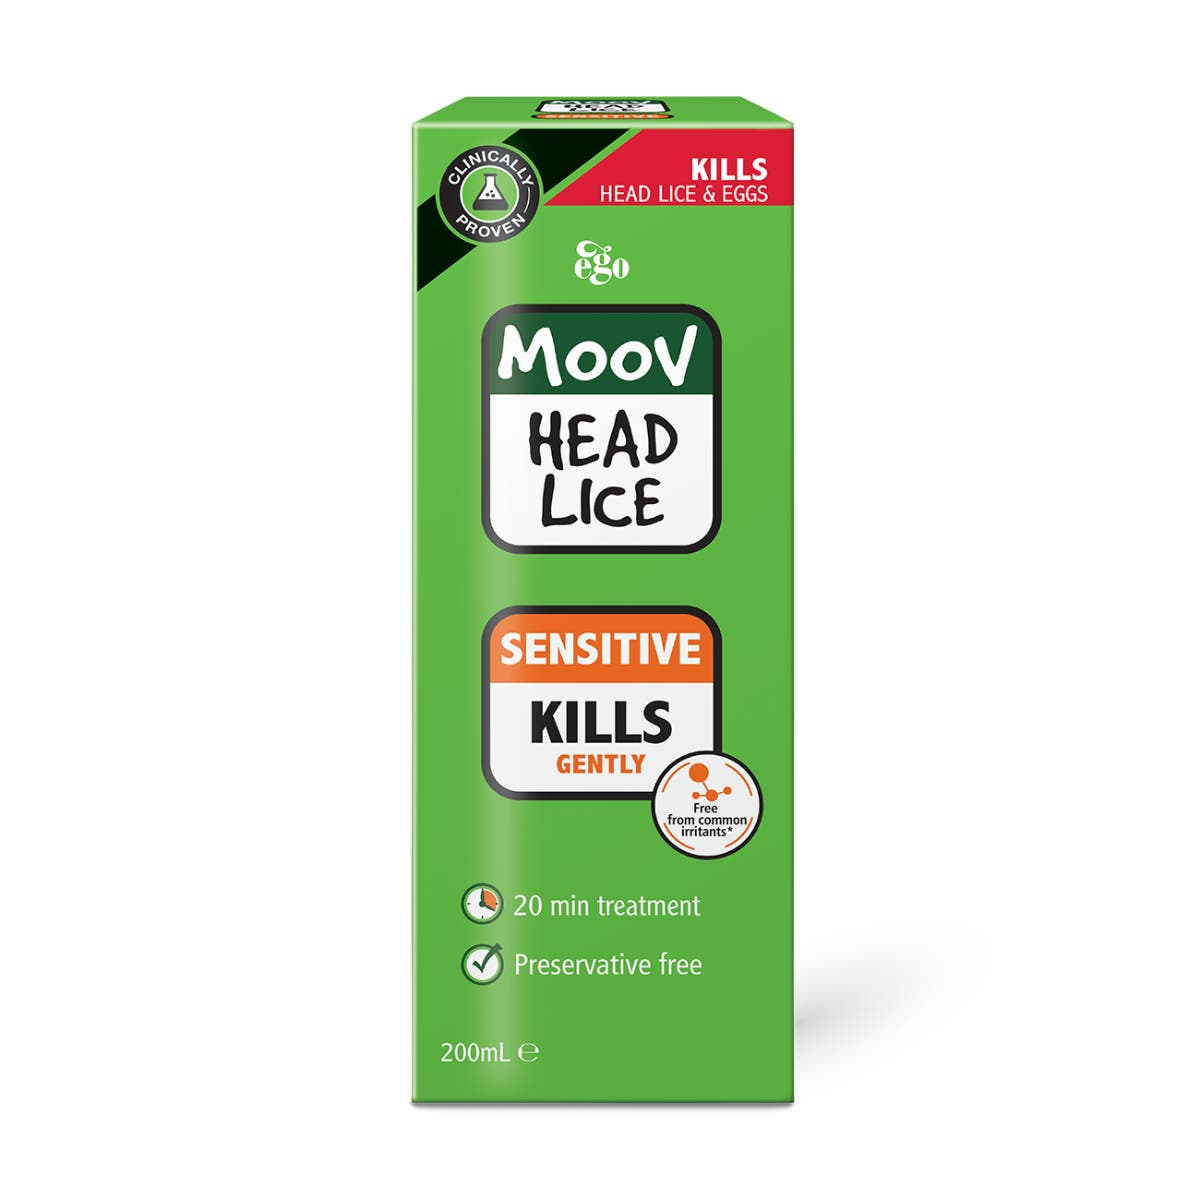 MOOV Head Lice Sensitive 200mL